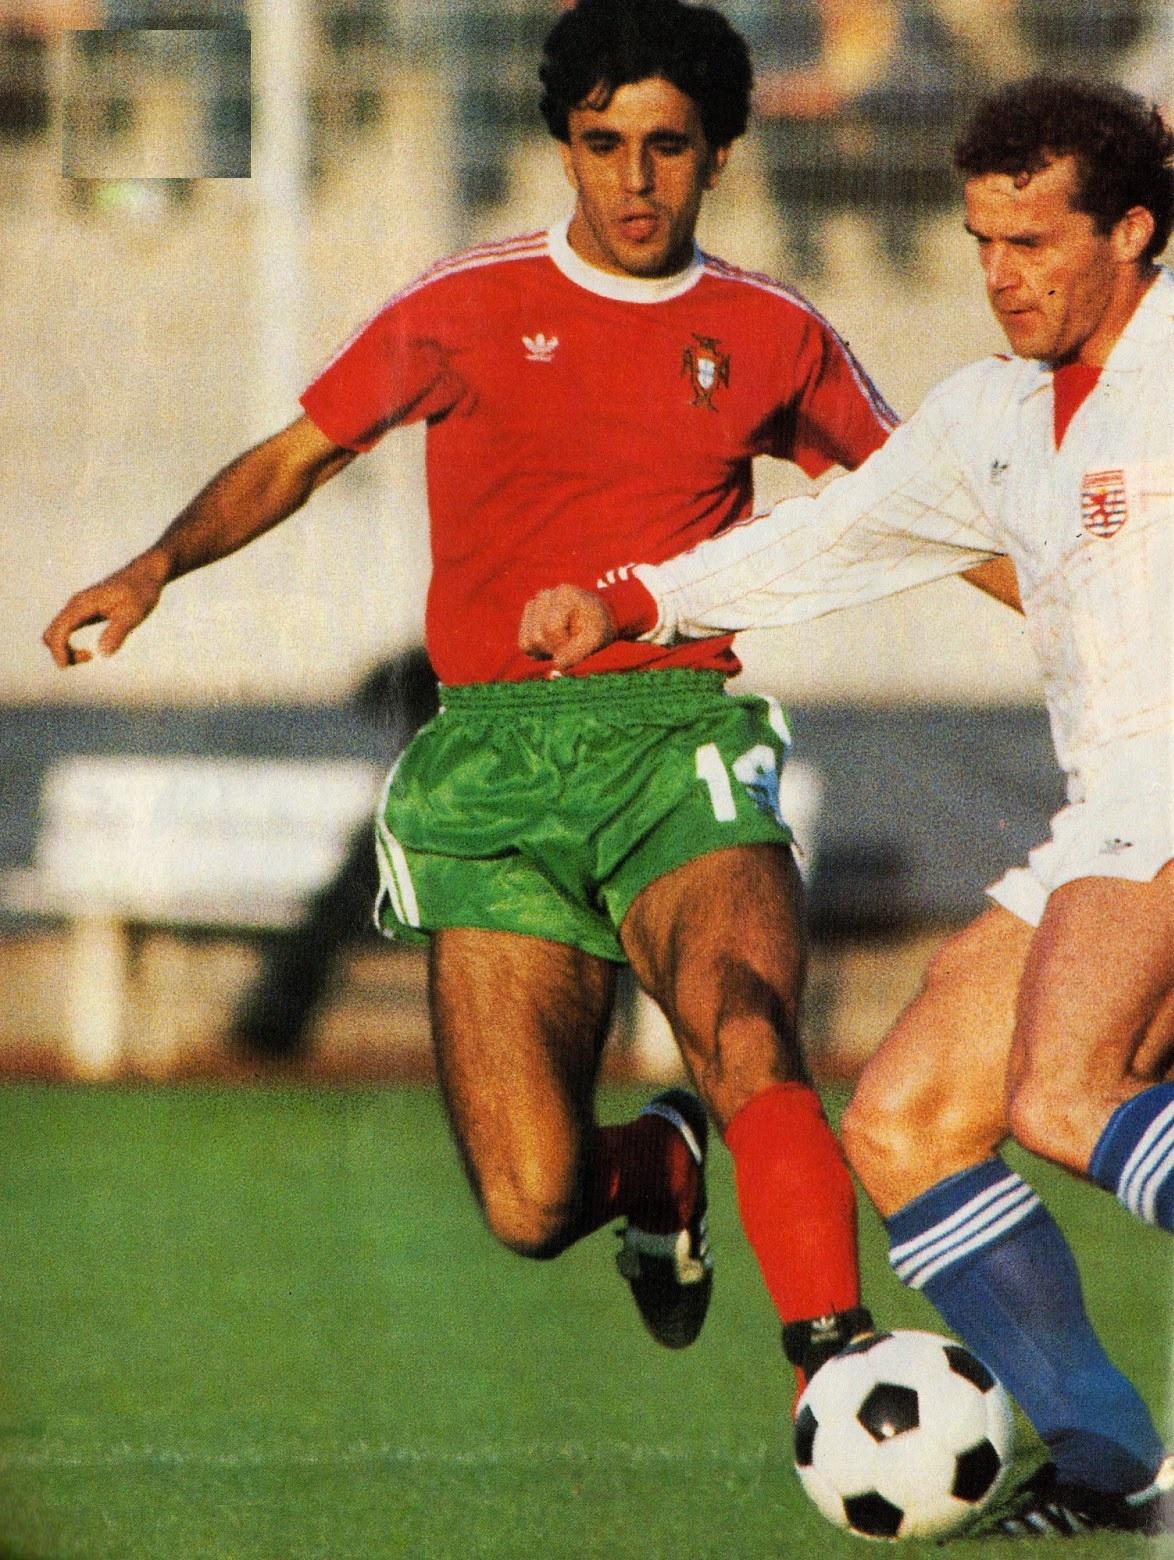 idokapszula_nb_i_1983_84_siofok_raba_eto_mnk_donto_luxemburg_portugalia.jpg